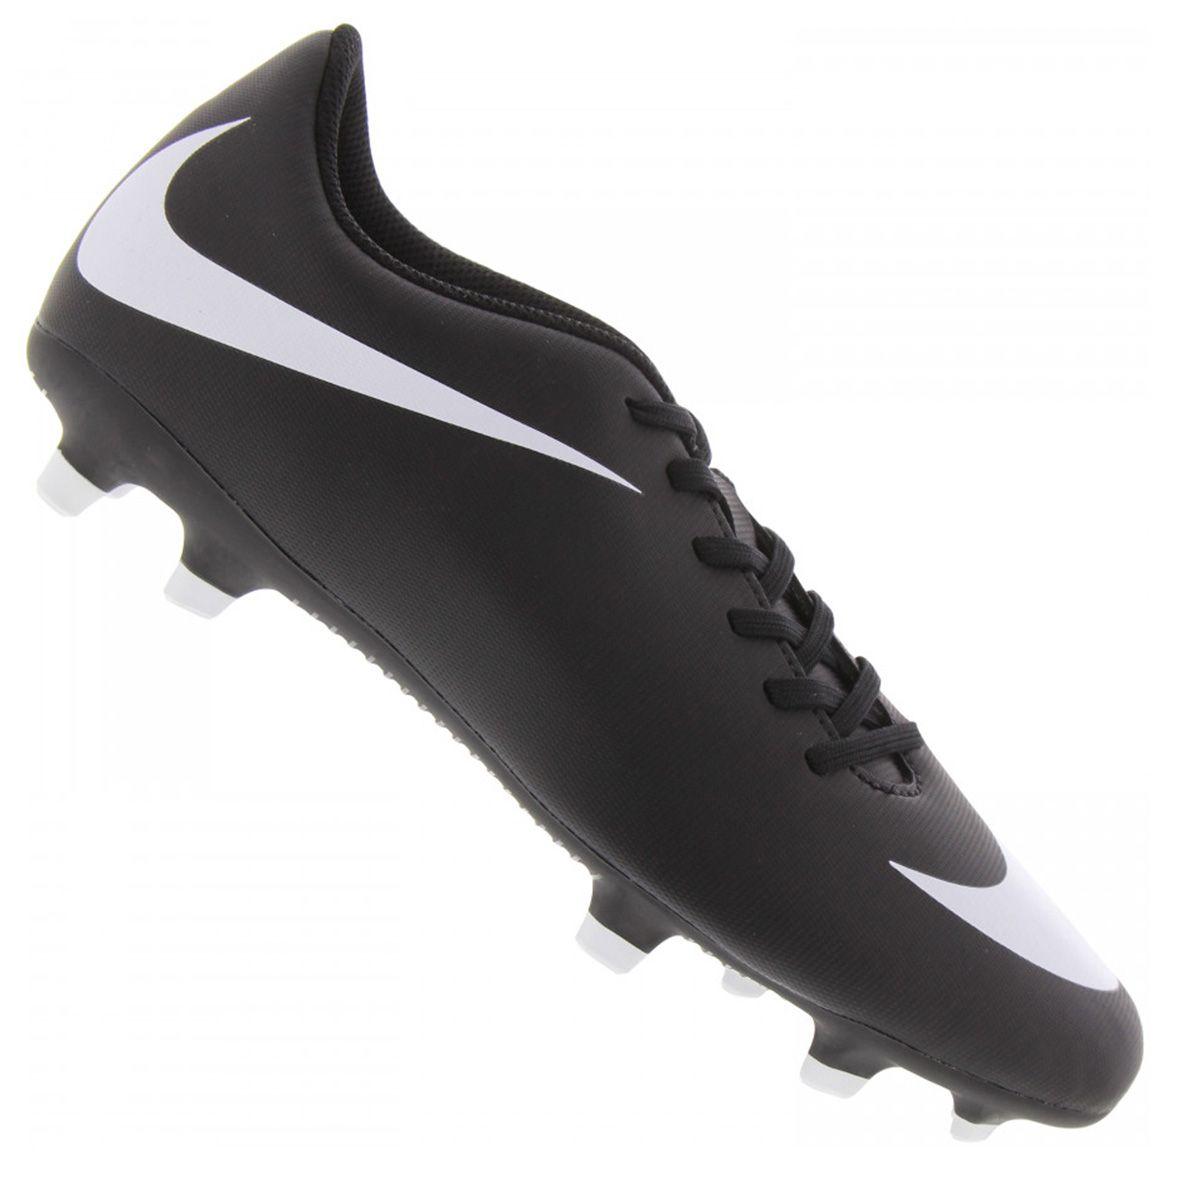 Chuteira Campo Nike Bravata II FG